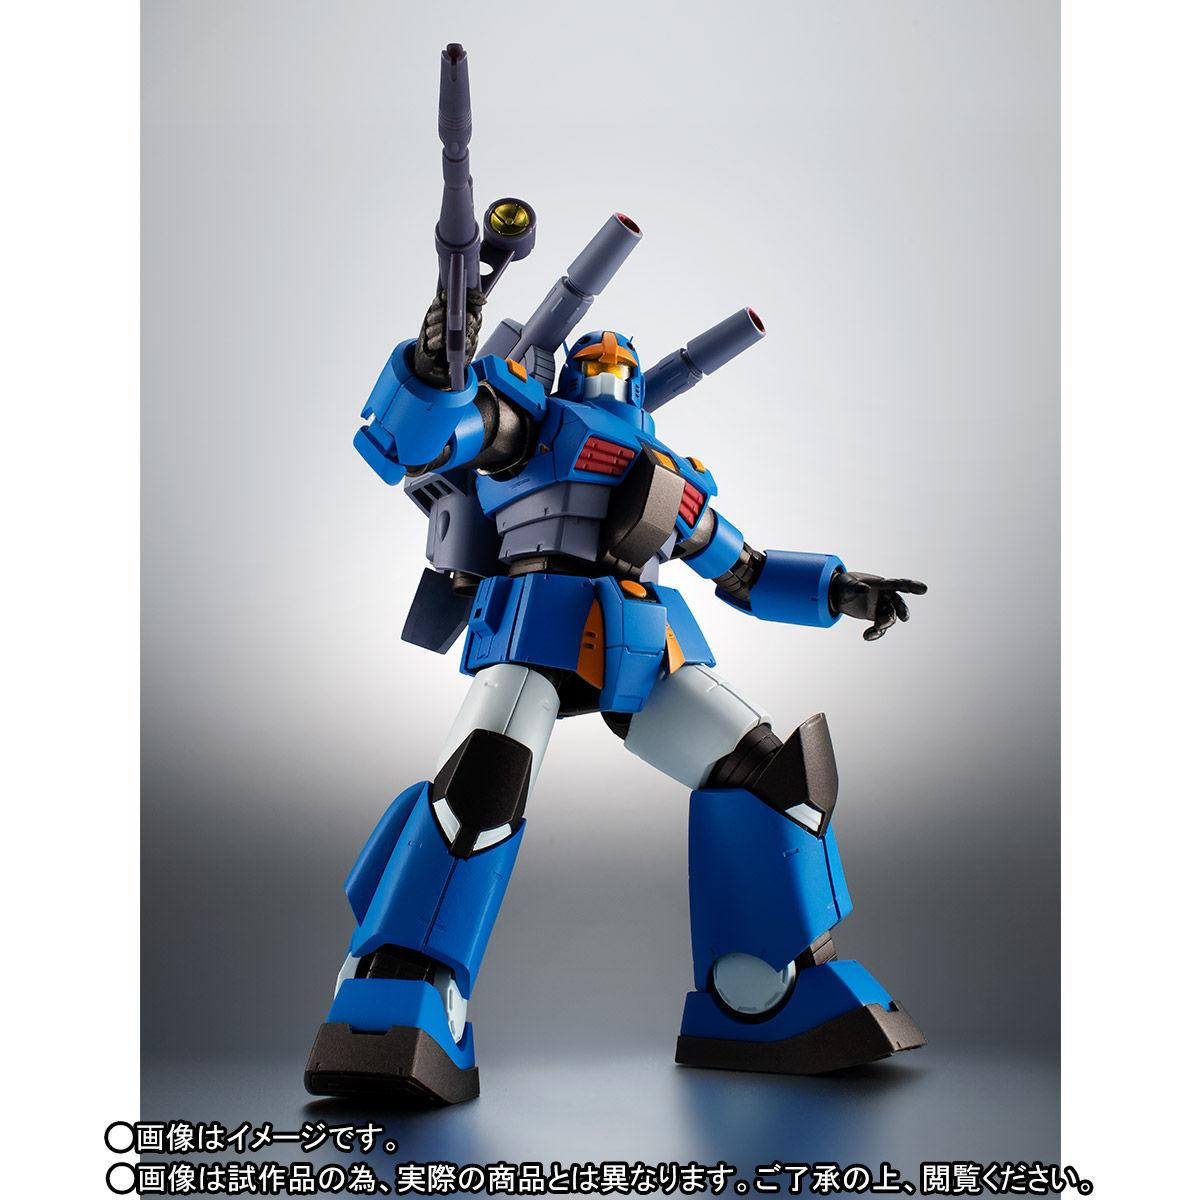 ROBOT魂〈SIDE MS〉『RX-77-3 ガンキャノン重装型 ver. A.N.I.M.E.』ガンダムMSV 可動フィギュア-003